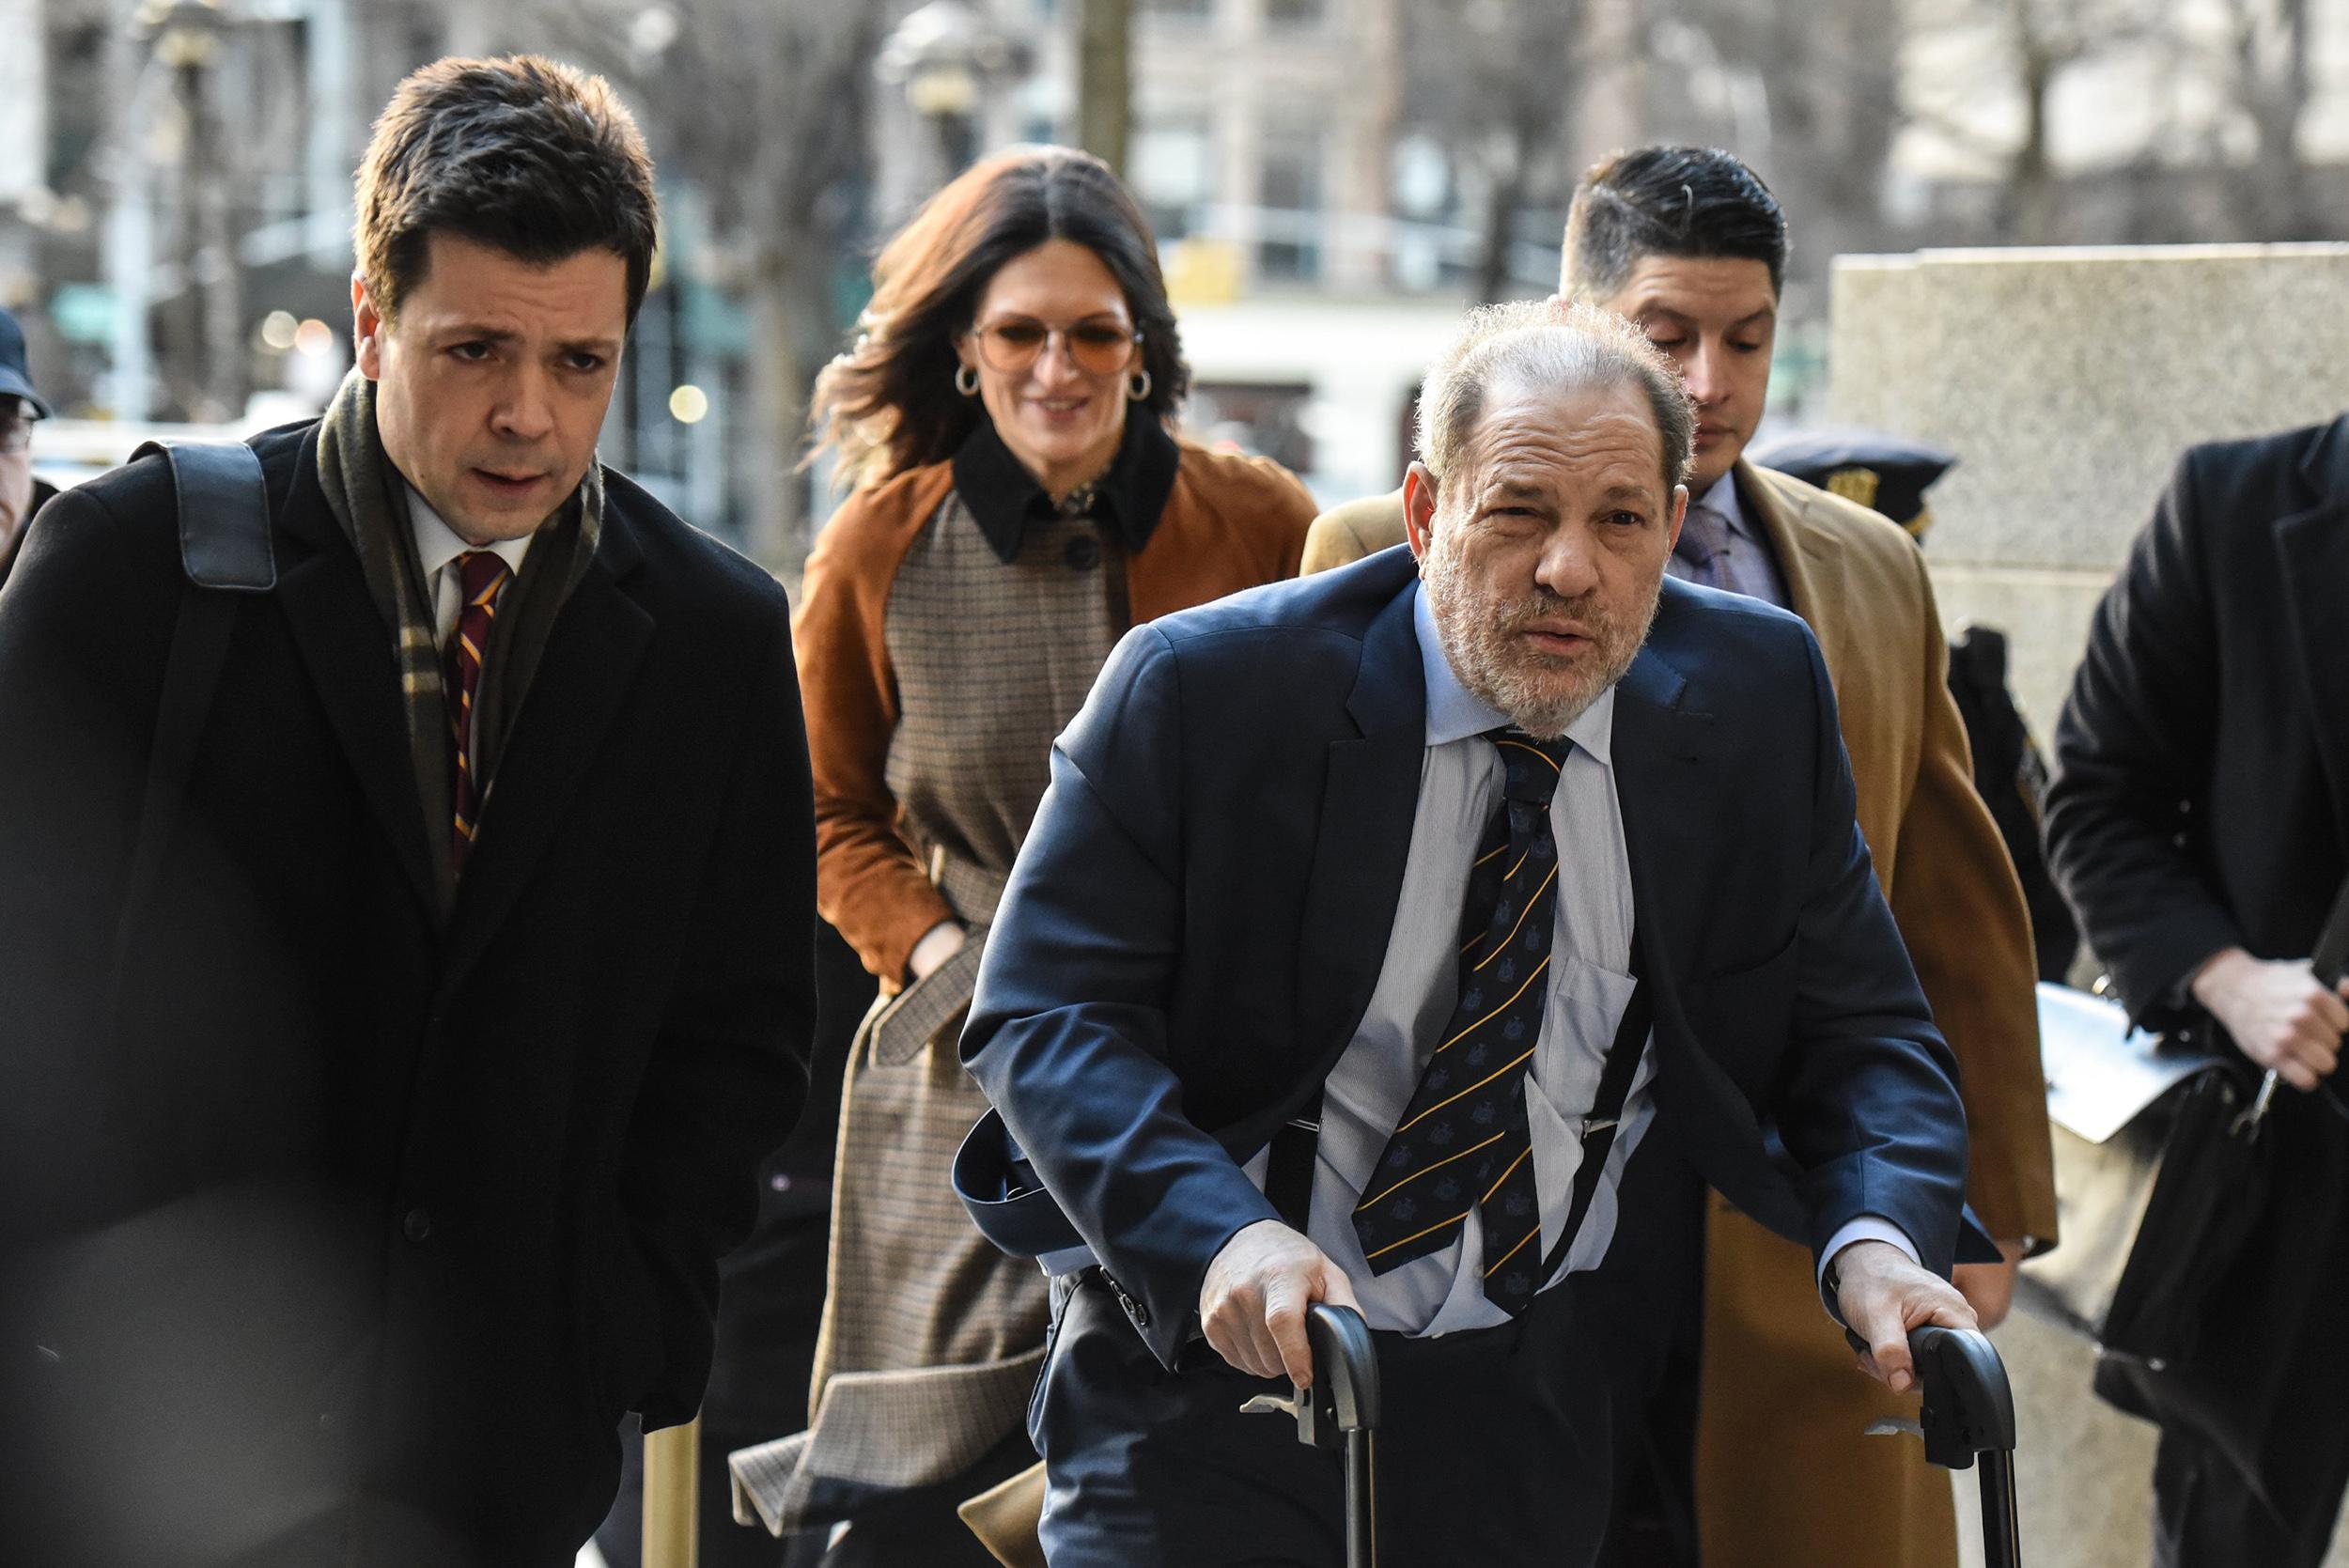 Prosecutor In Harvey Weinstein Trial He Believed He Ran The Universe